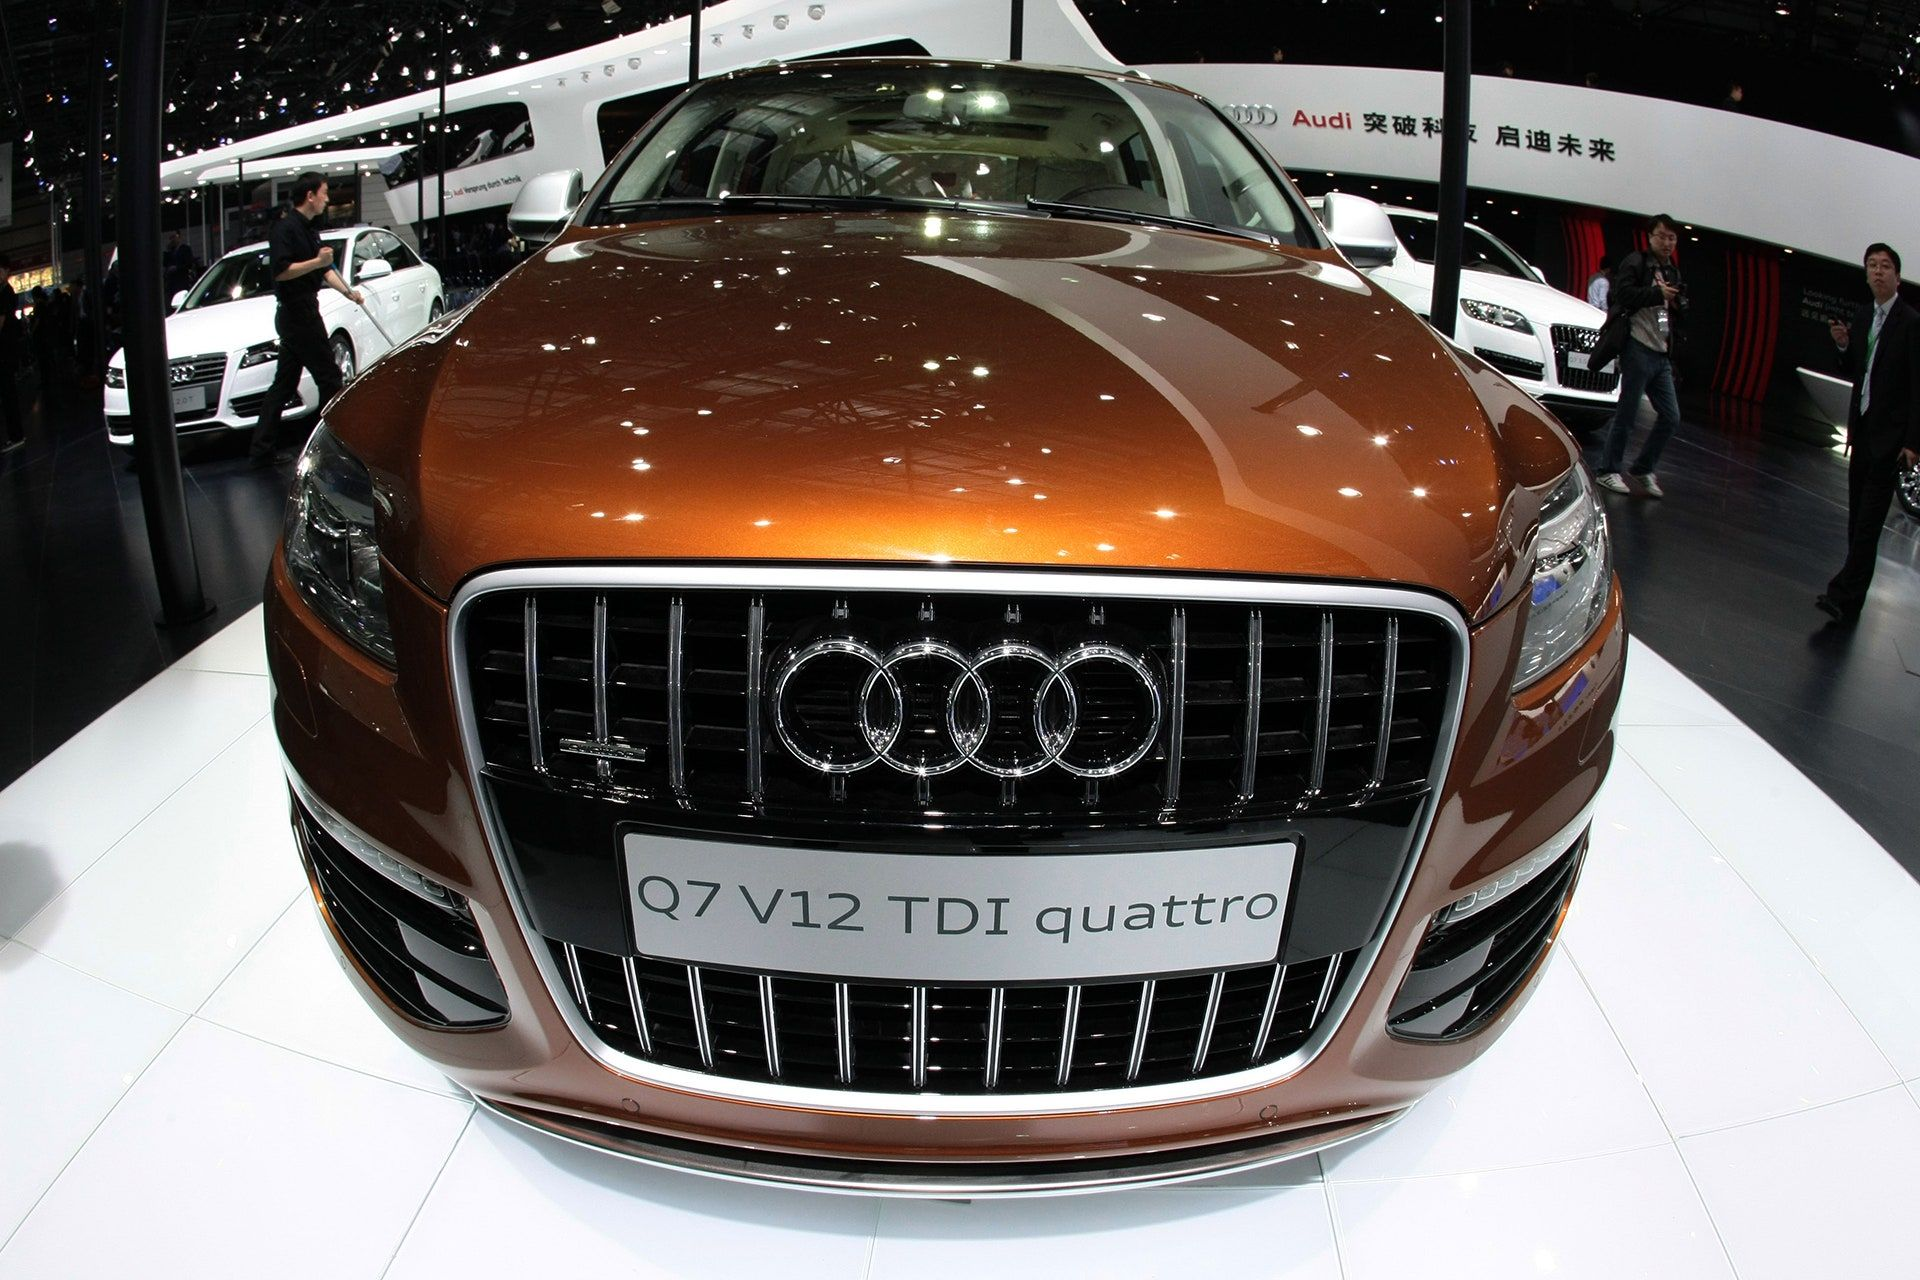 "<img src=""elon-musk-q7.jpg"" alt=""Audi Q7"">"